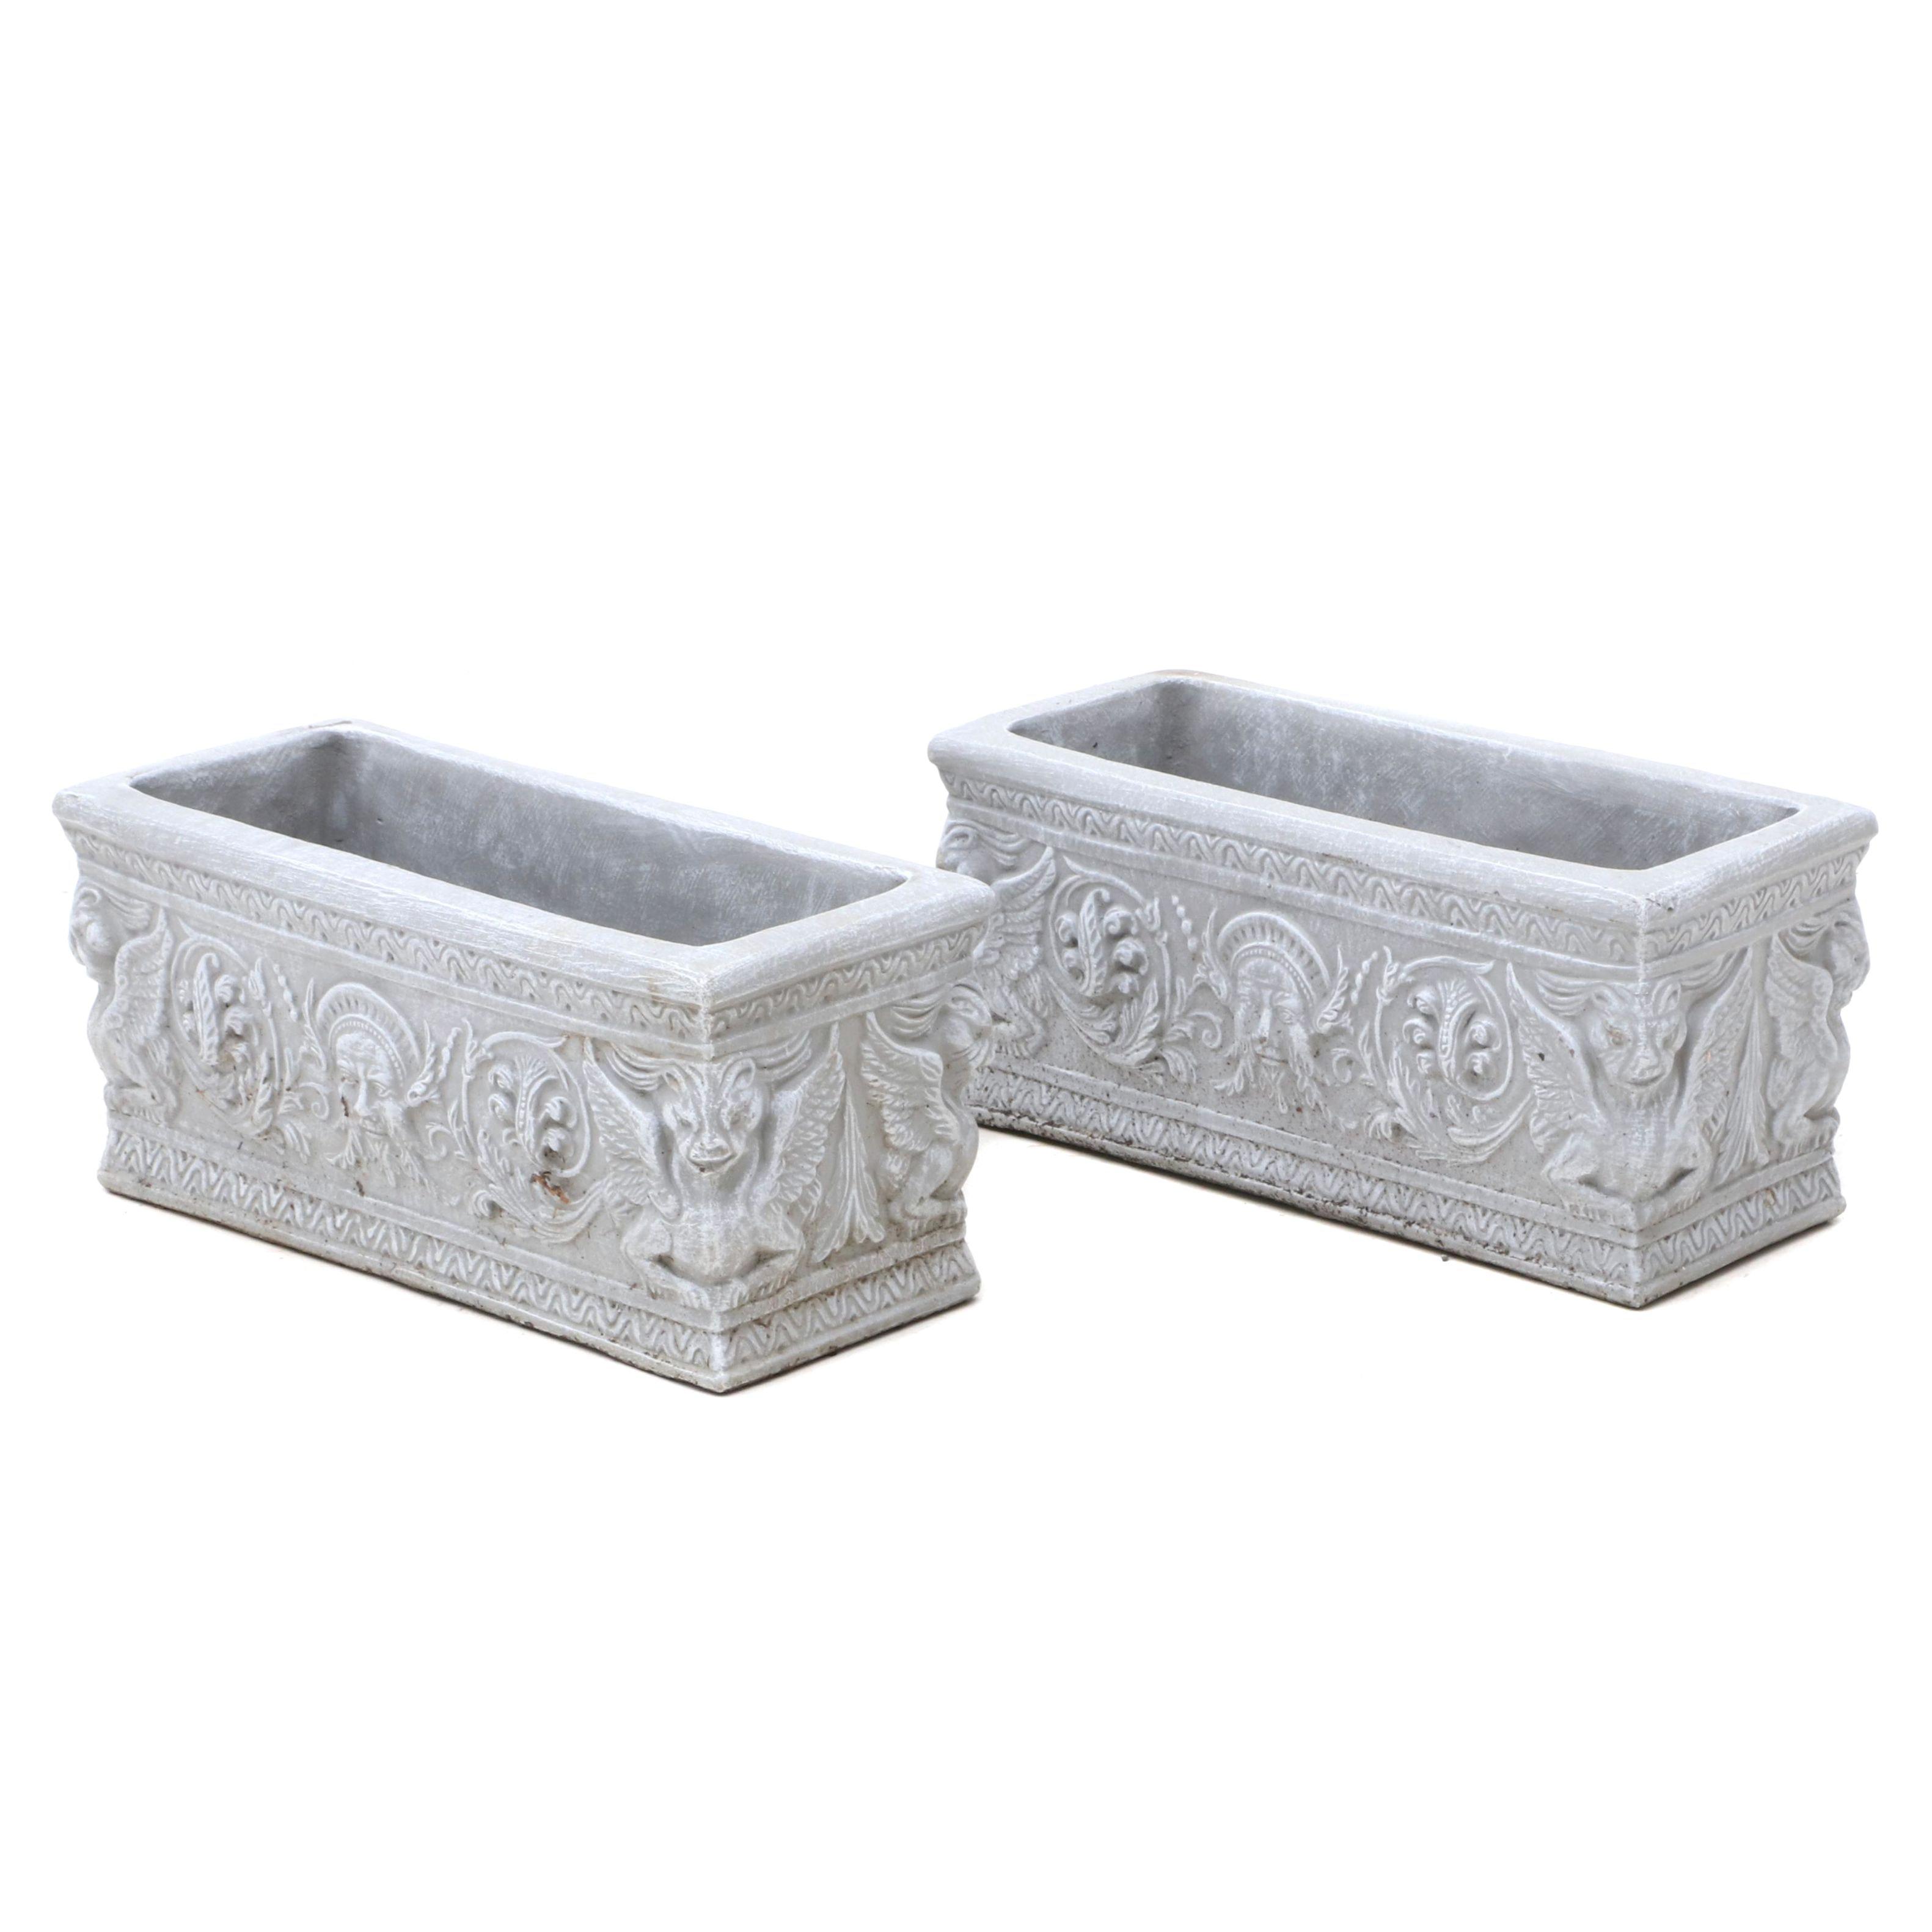 Decorative Concrete Box Planters